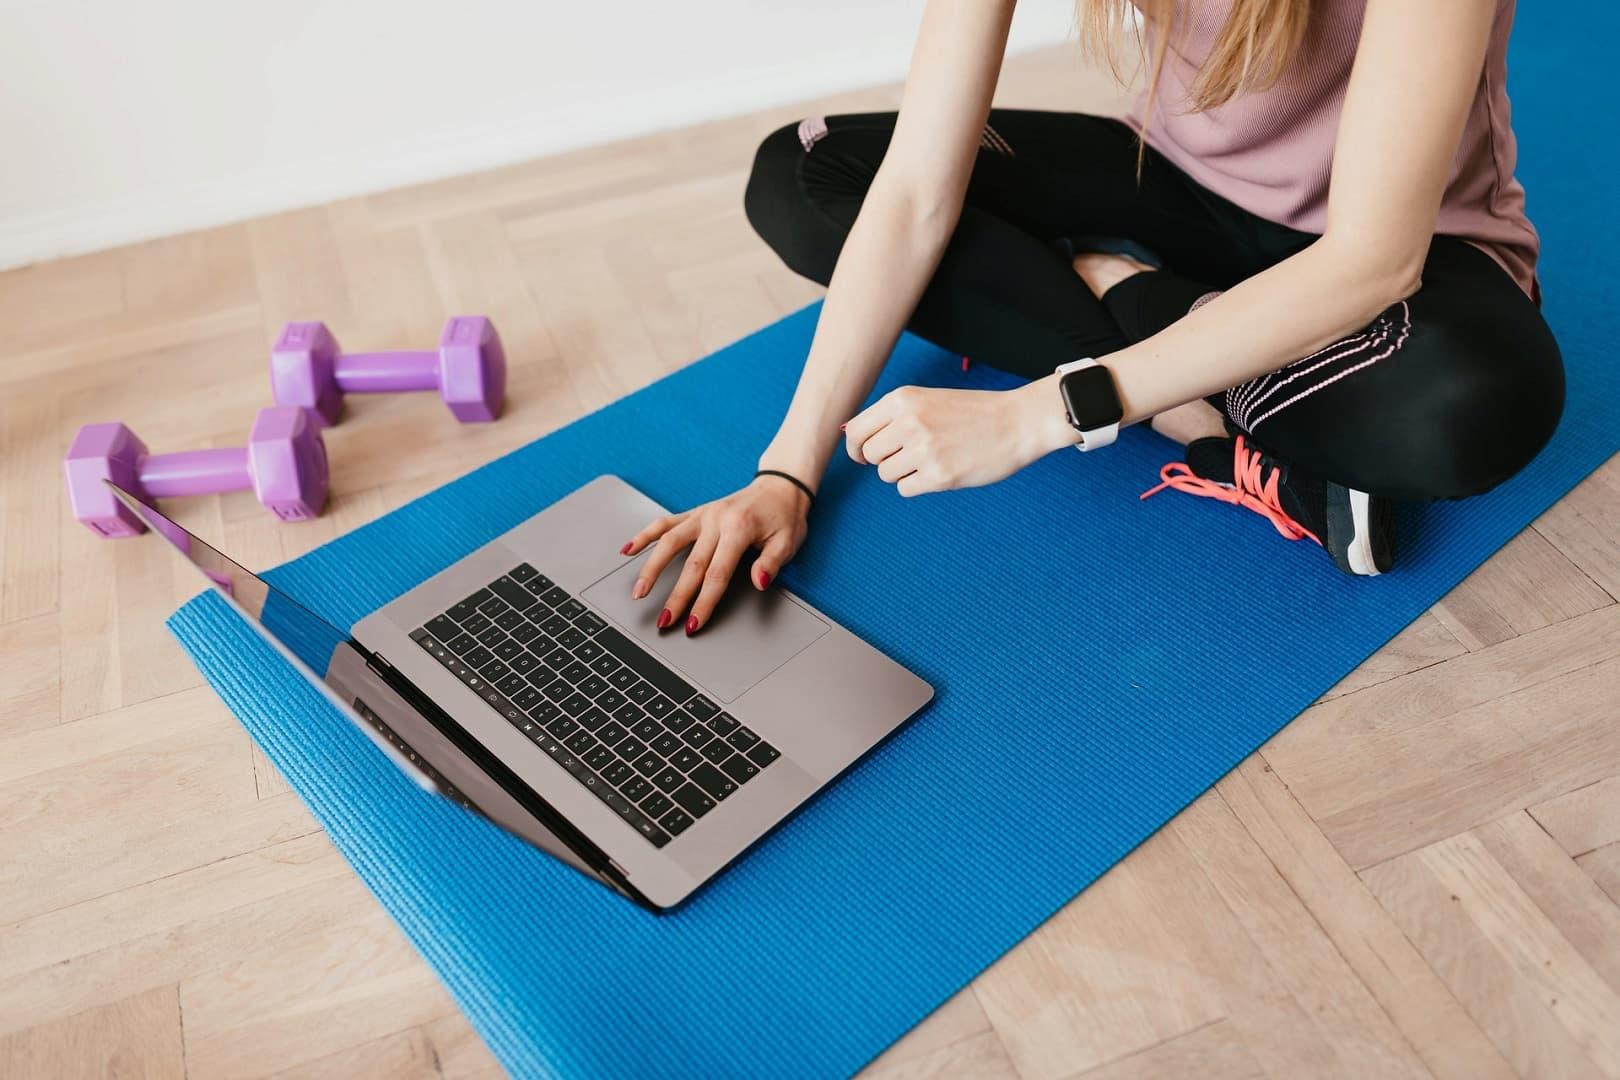 Personal Training Online in Australia